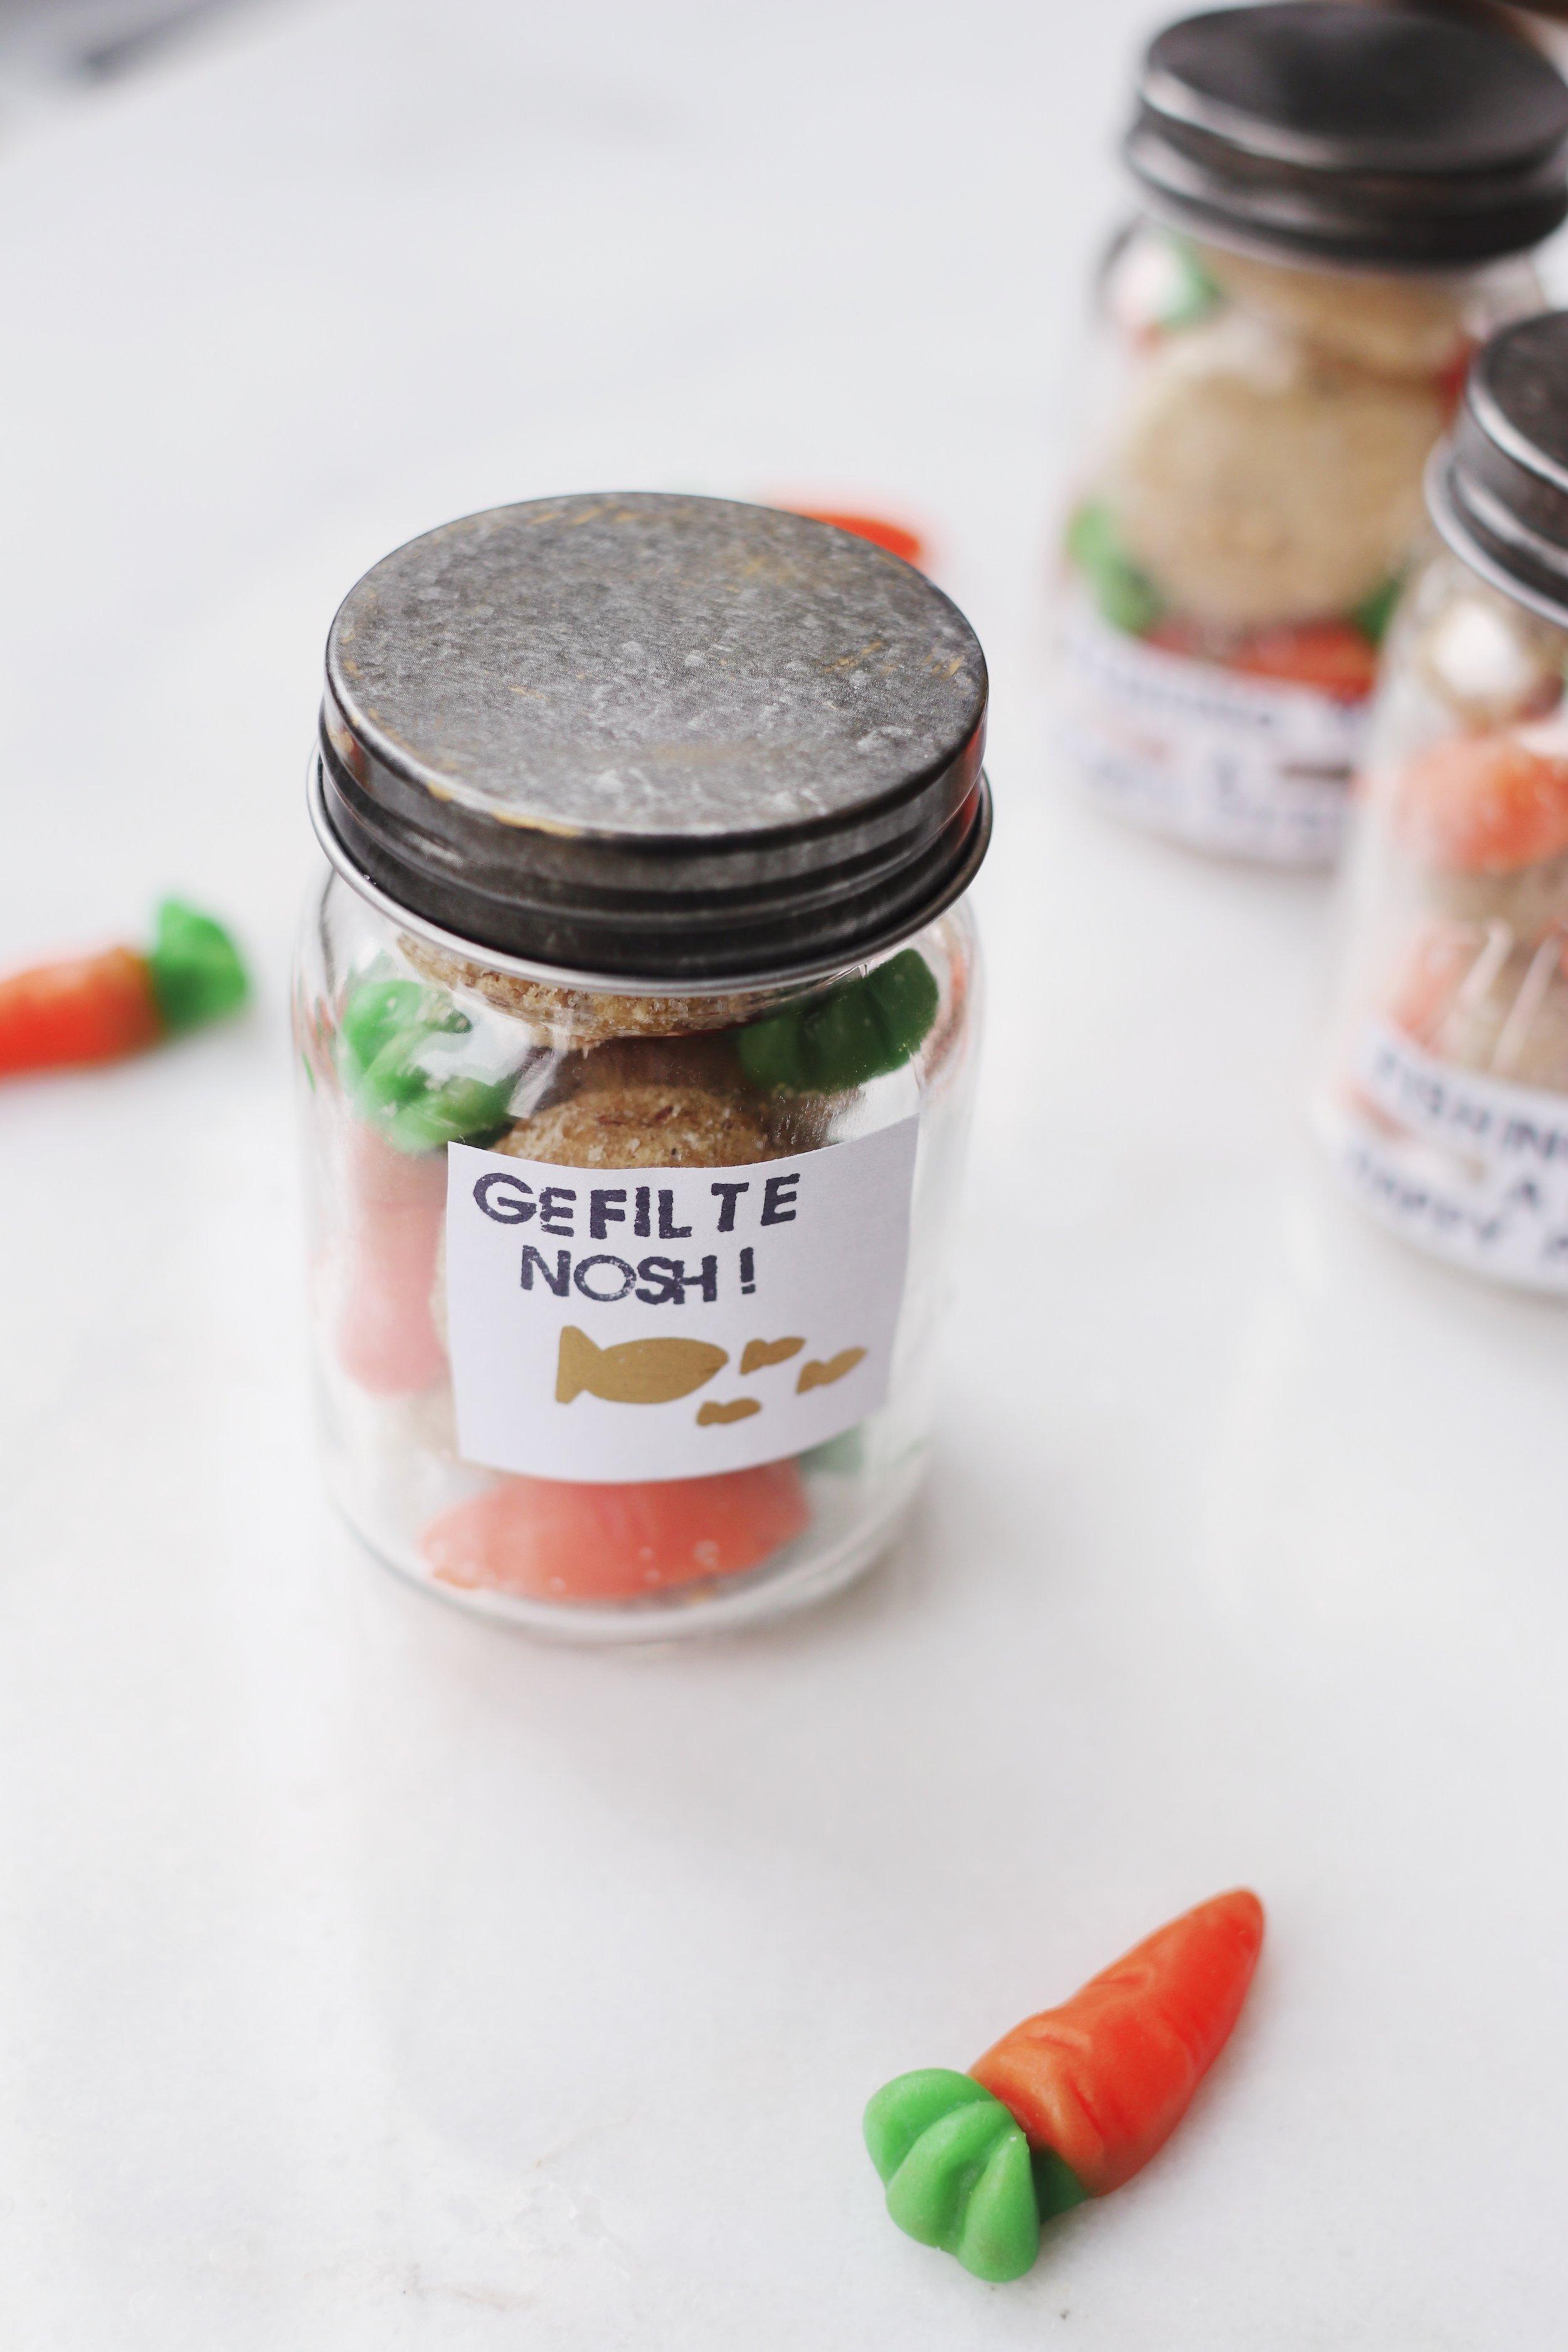 mishloach-manot-passover-favor-seder-gift-dessert-cookie-gefilte-fish-carrot-candy